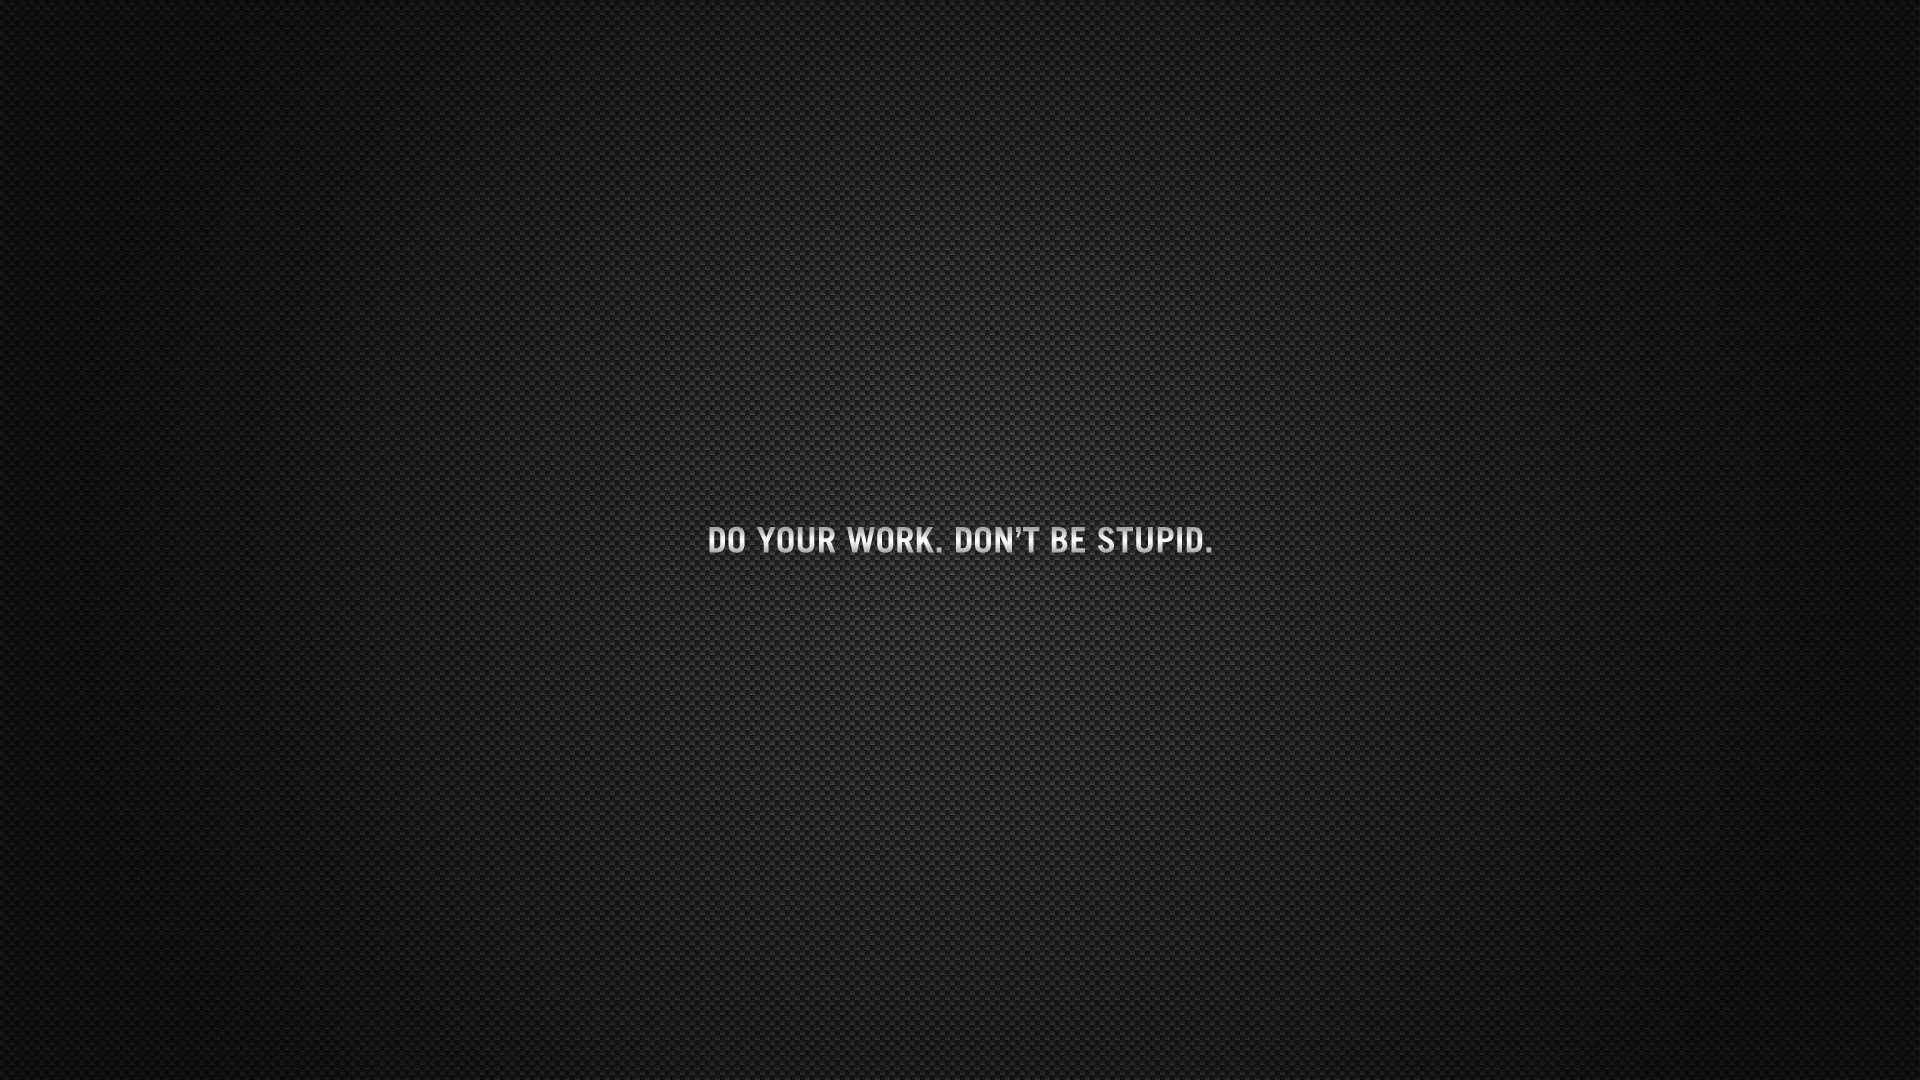 Download Wallpaper 1920x1080 Inscription Cardboard Black Do Your Work Advice Full Hd 1080p Hd Background